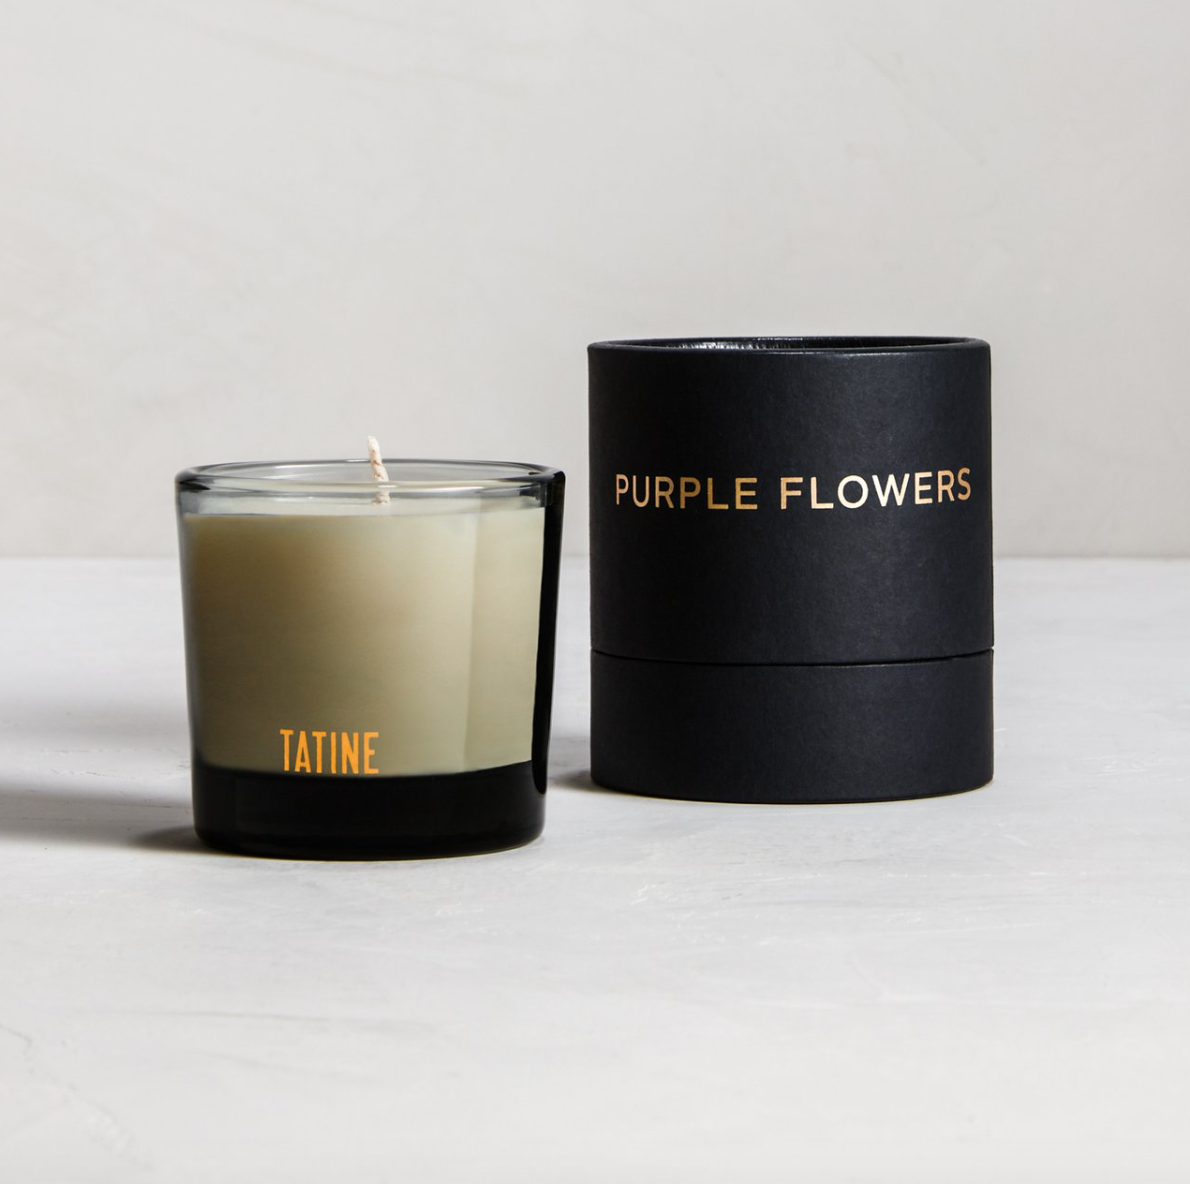 Tatine Purple Flowers Votive Candle